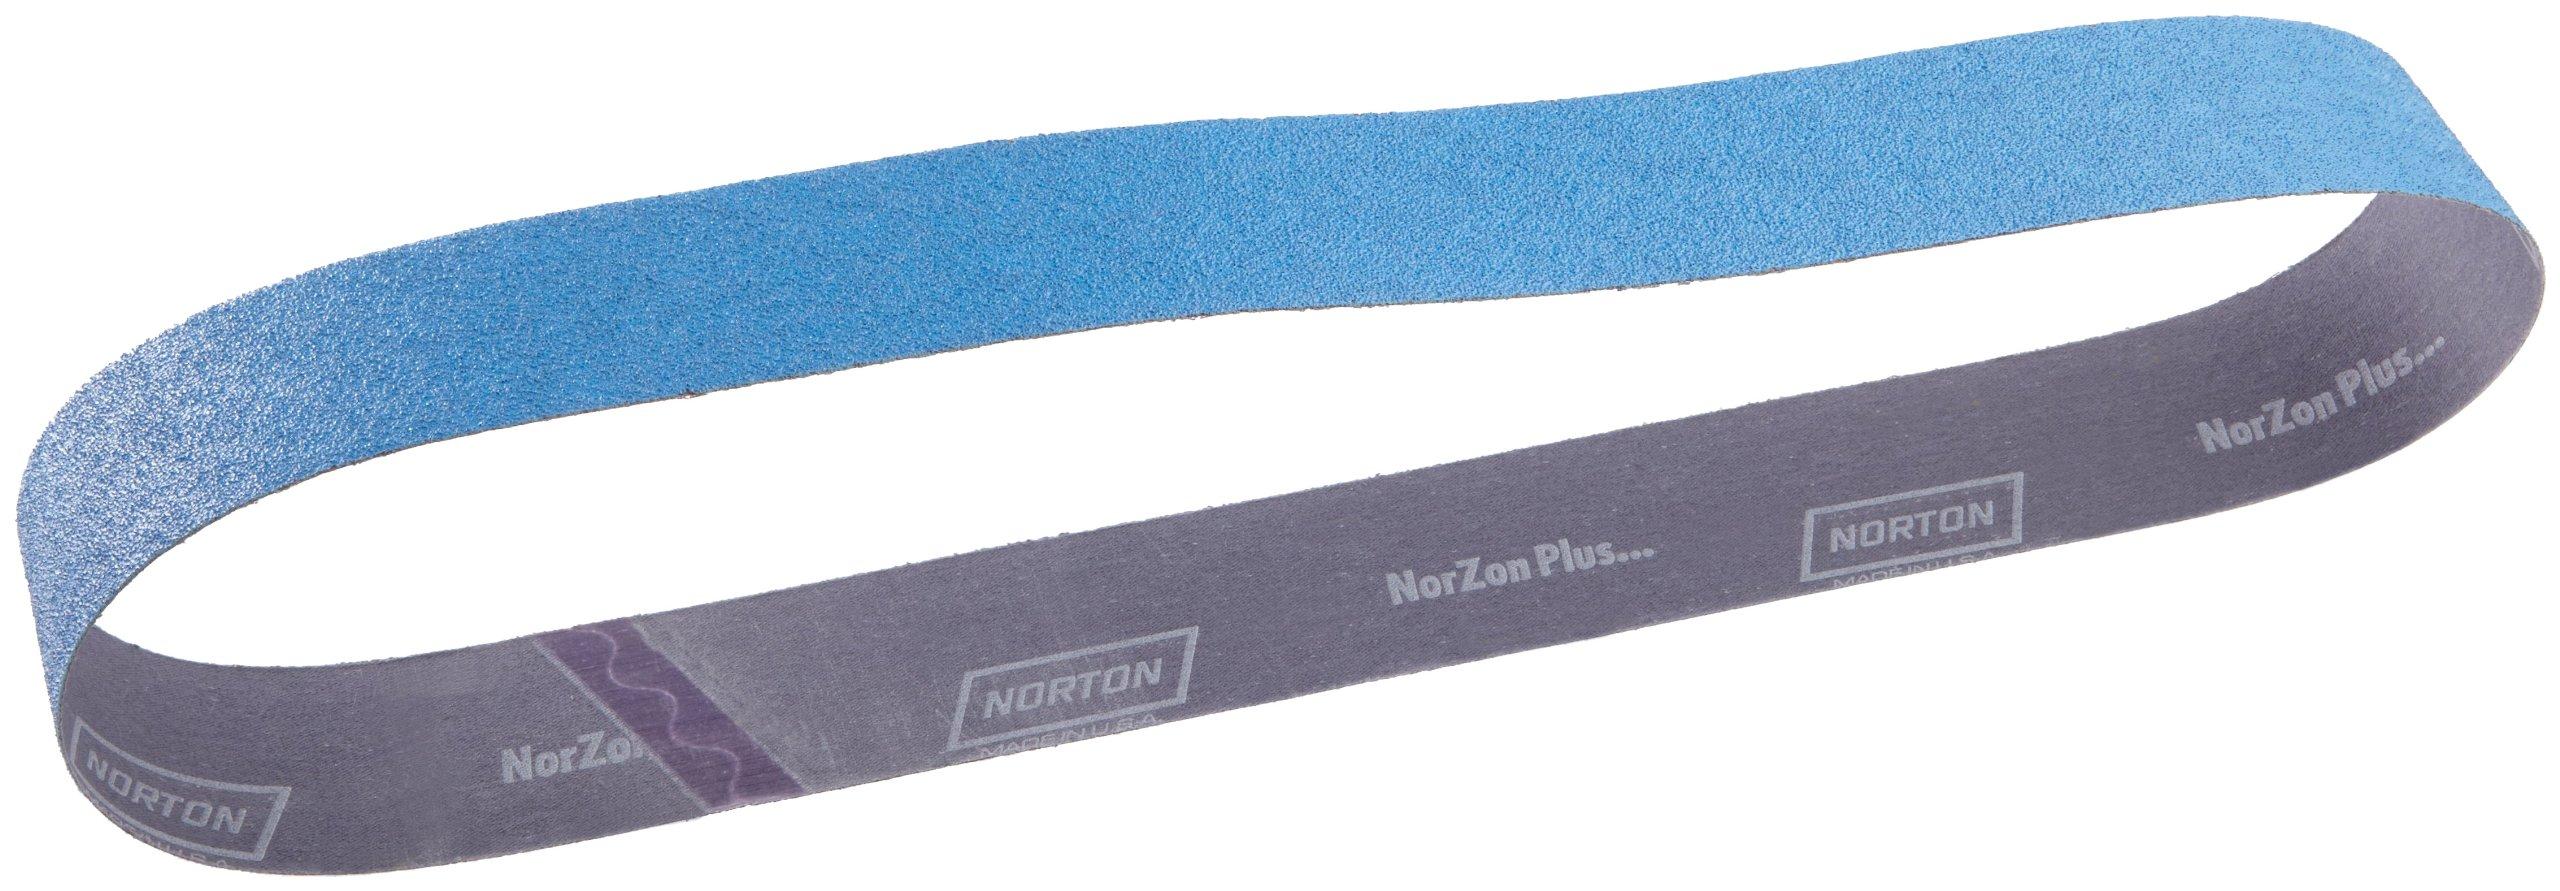 Norton BlueFire R821P Benchstand Abrasive Belt, Cotton Backing, Zirconia Alumina, 2-1/2'' Width, 60'' Length, Grit 50 (Pack of 10)